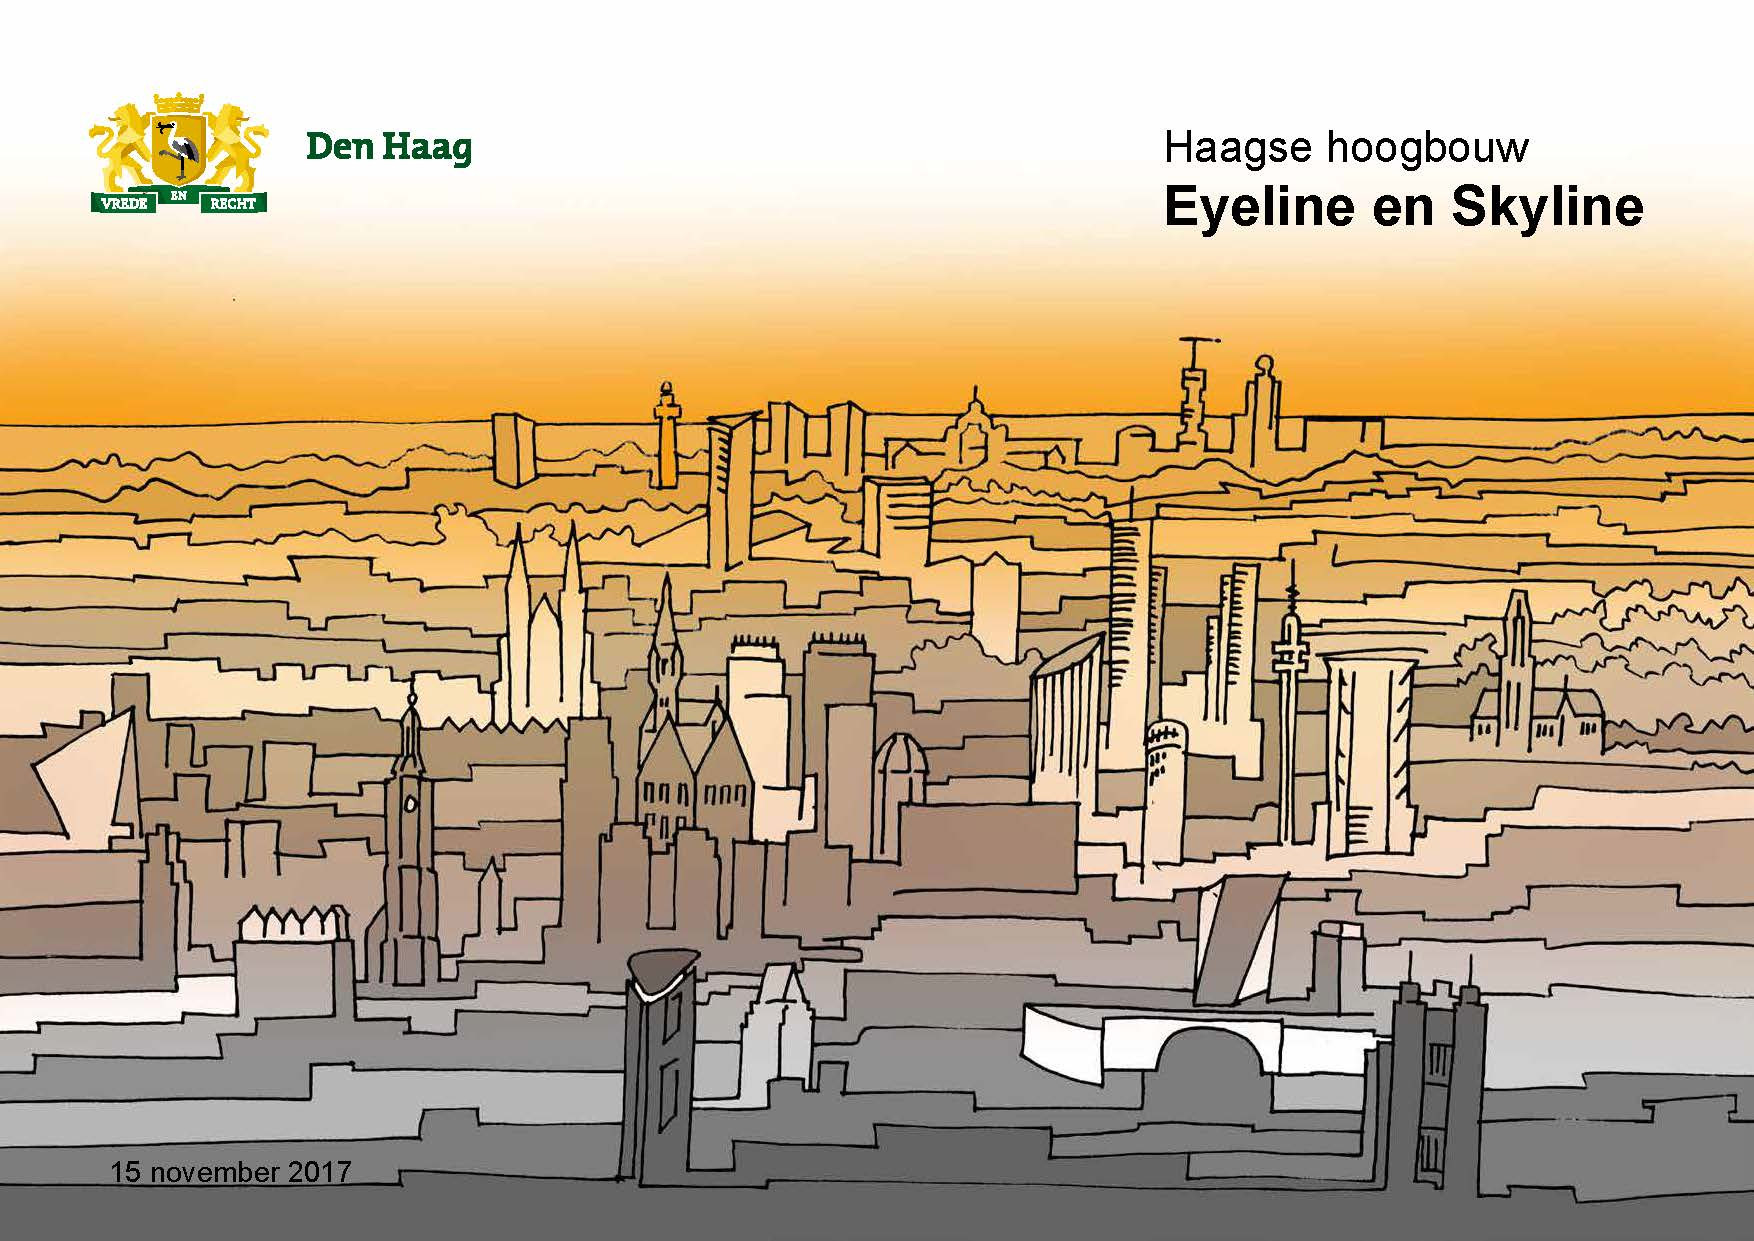 DSO.2017.1077 Nota Haagse hoogbouw E&S def_141117 LR_Pagina_01.jpg